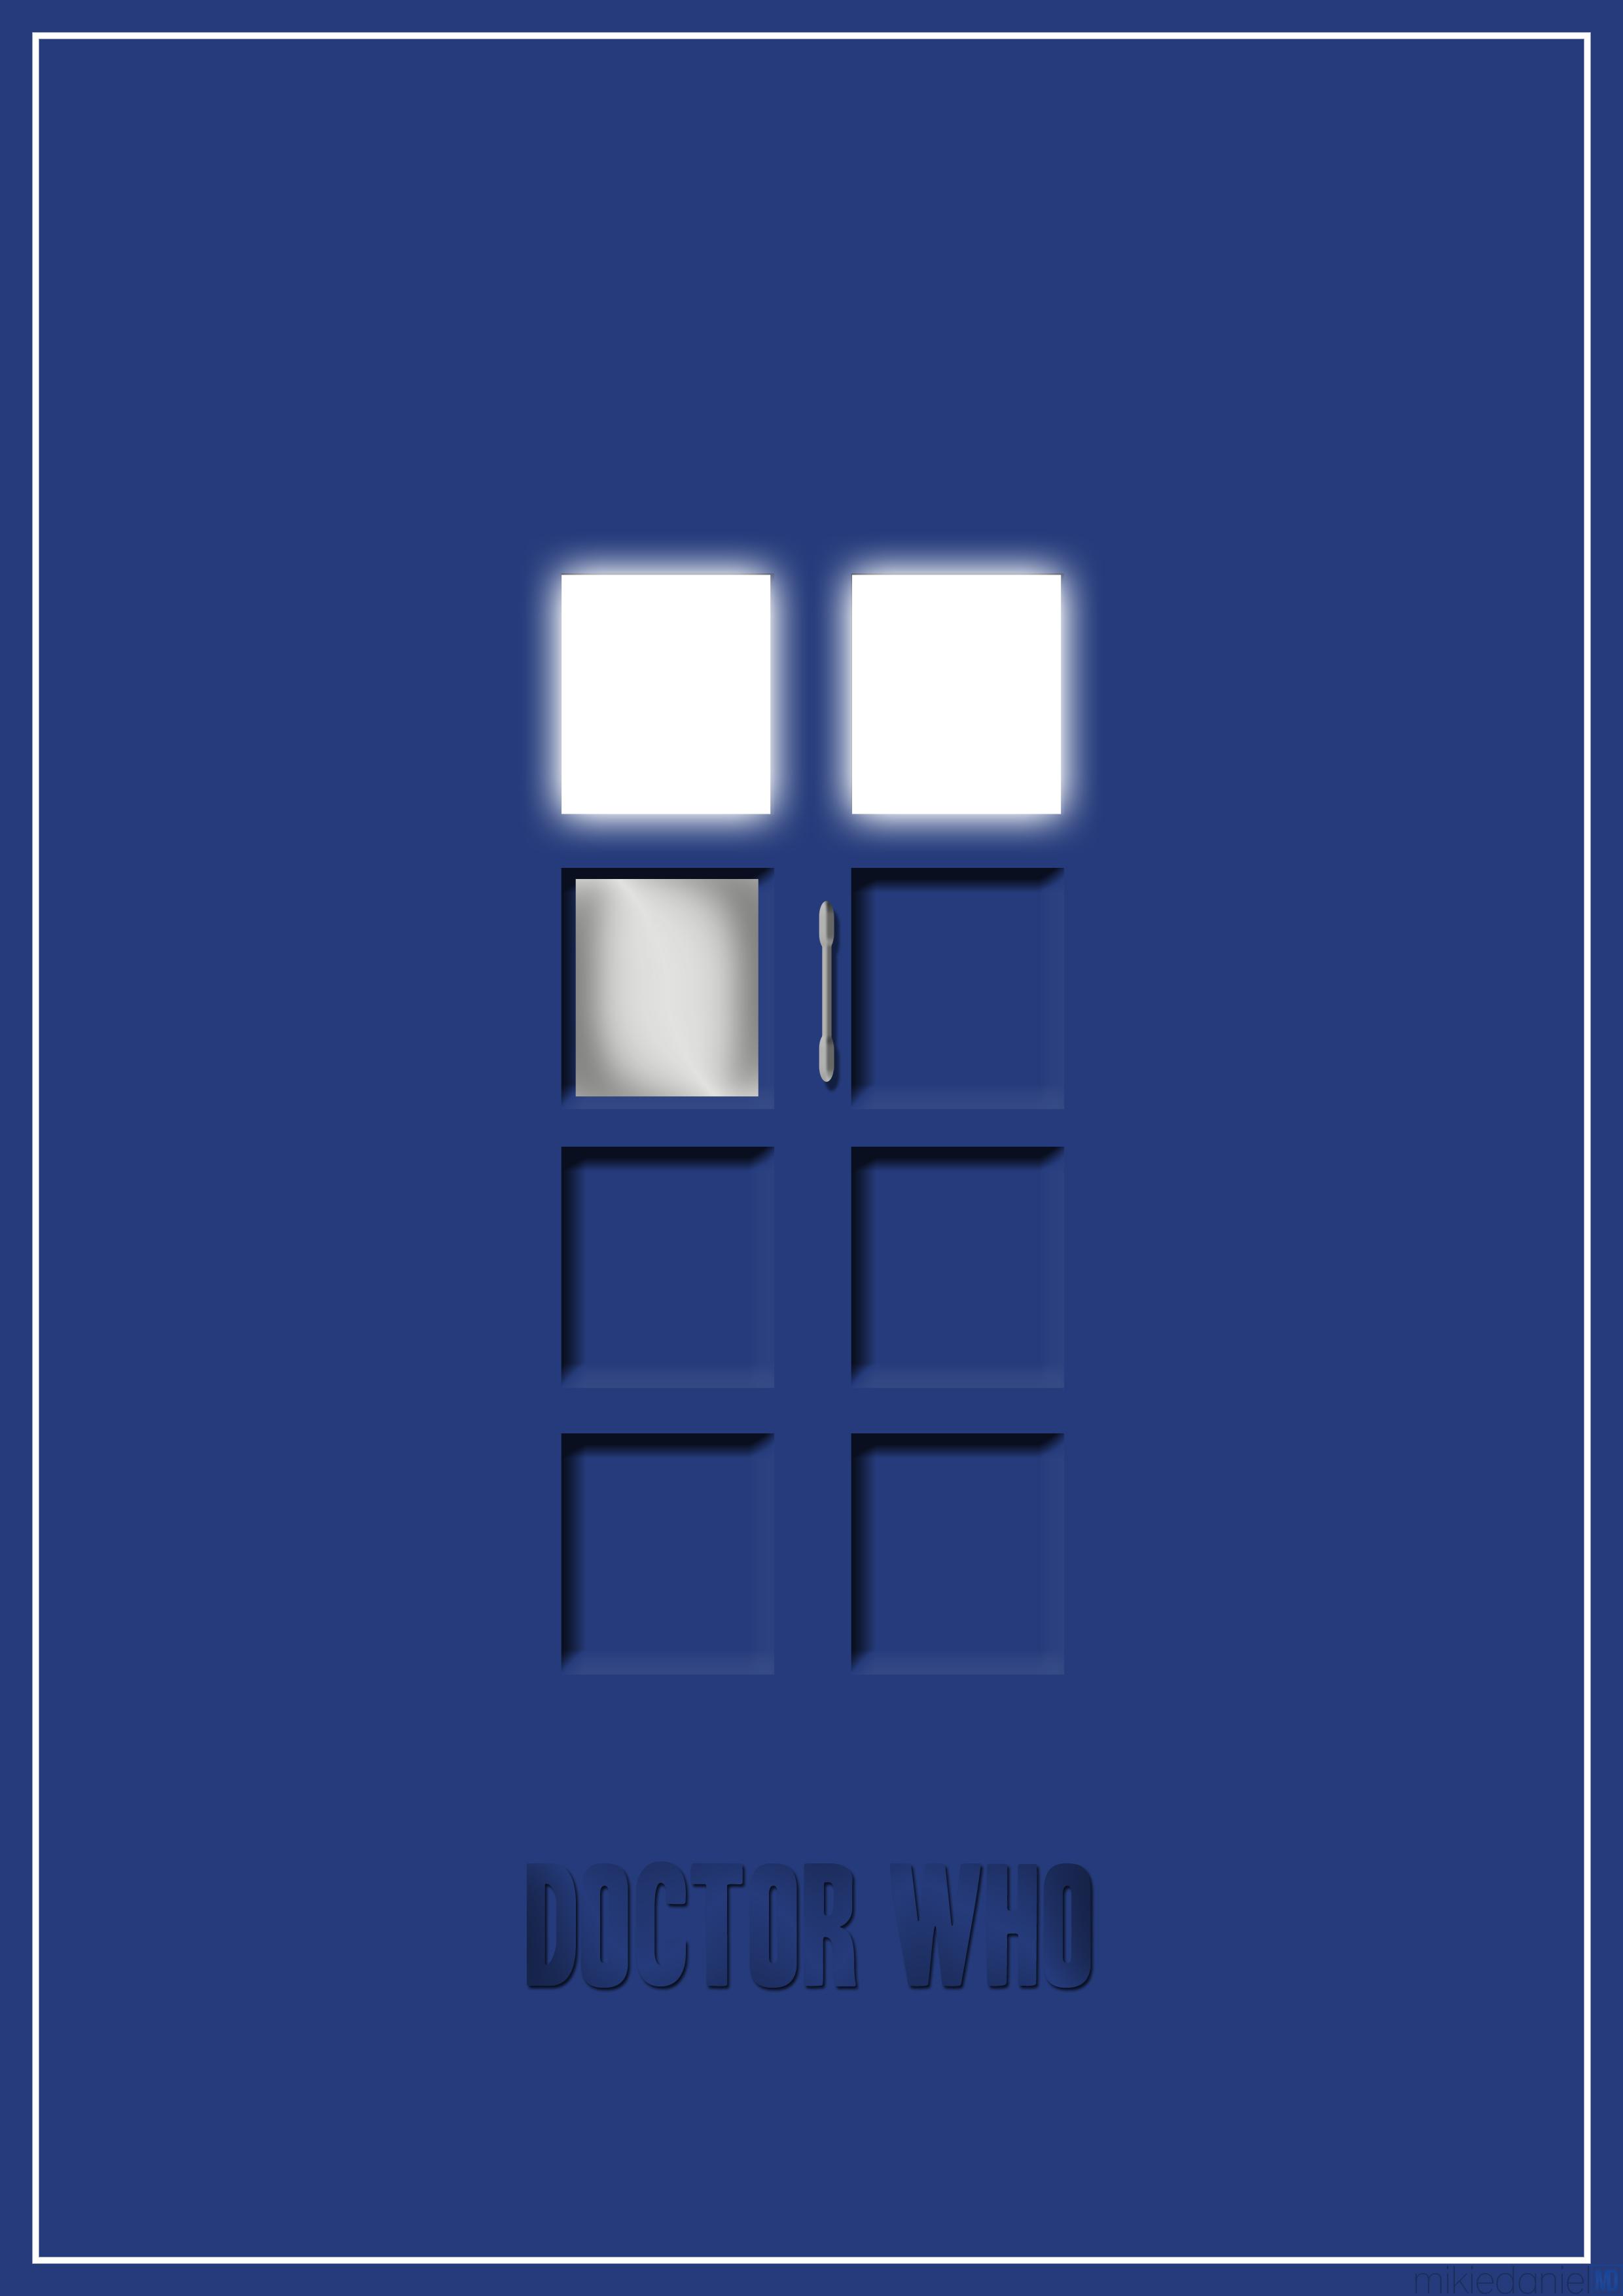 Doctor Who Minimal Posters u2013 Mikie Daniel